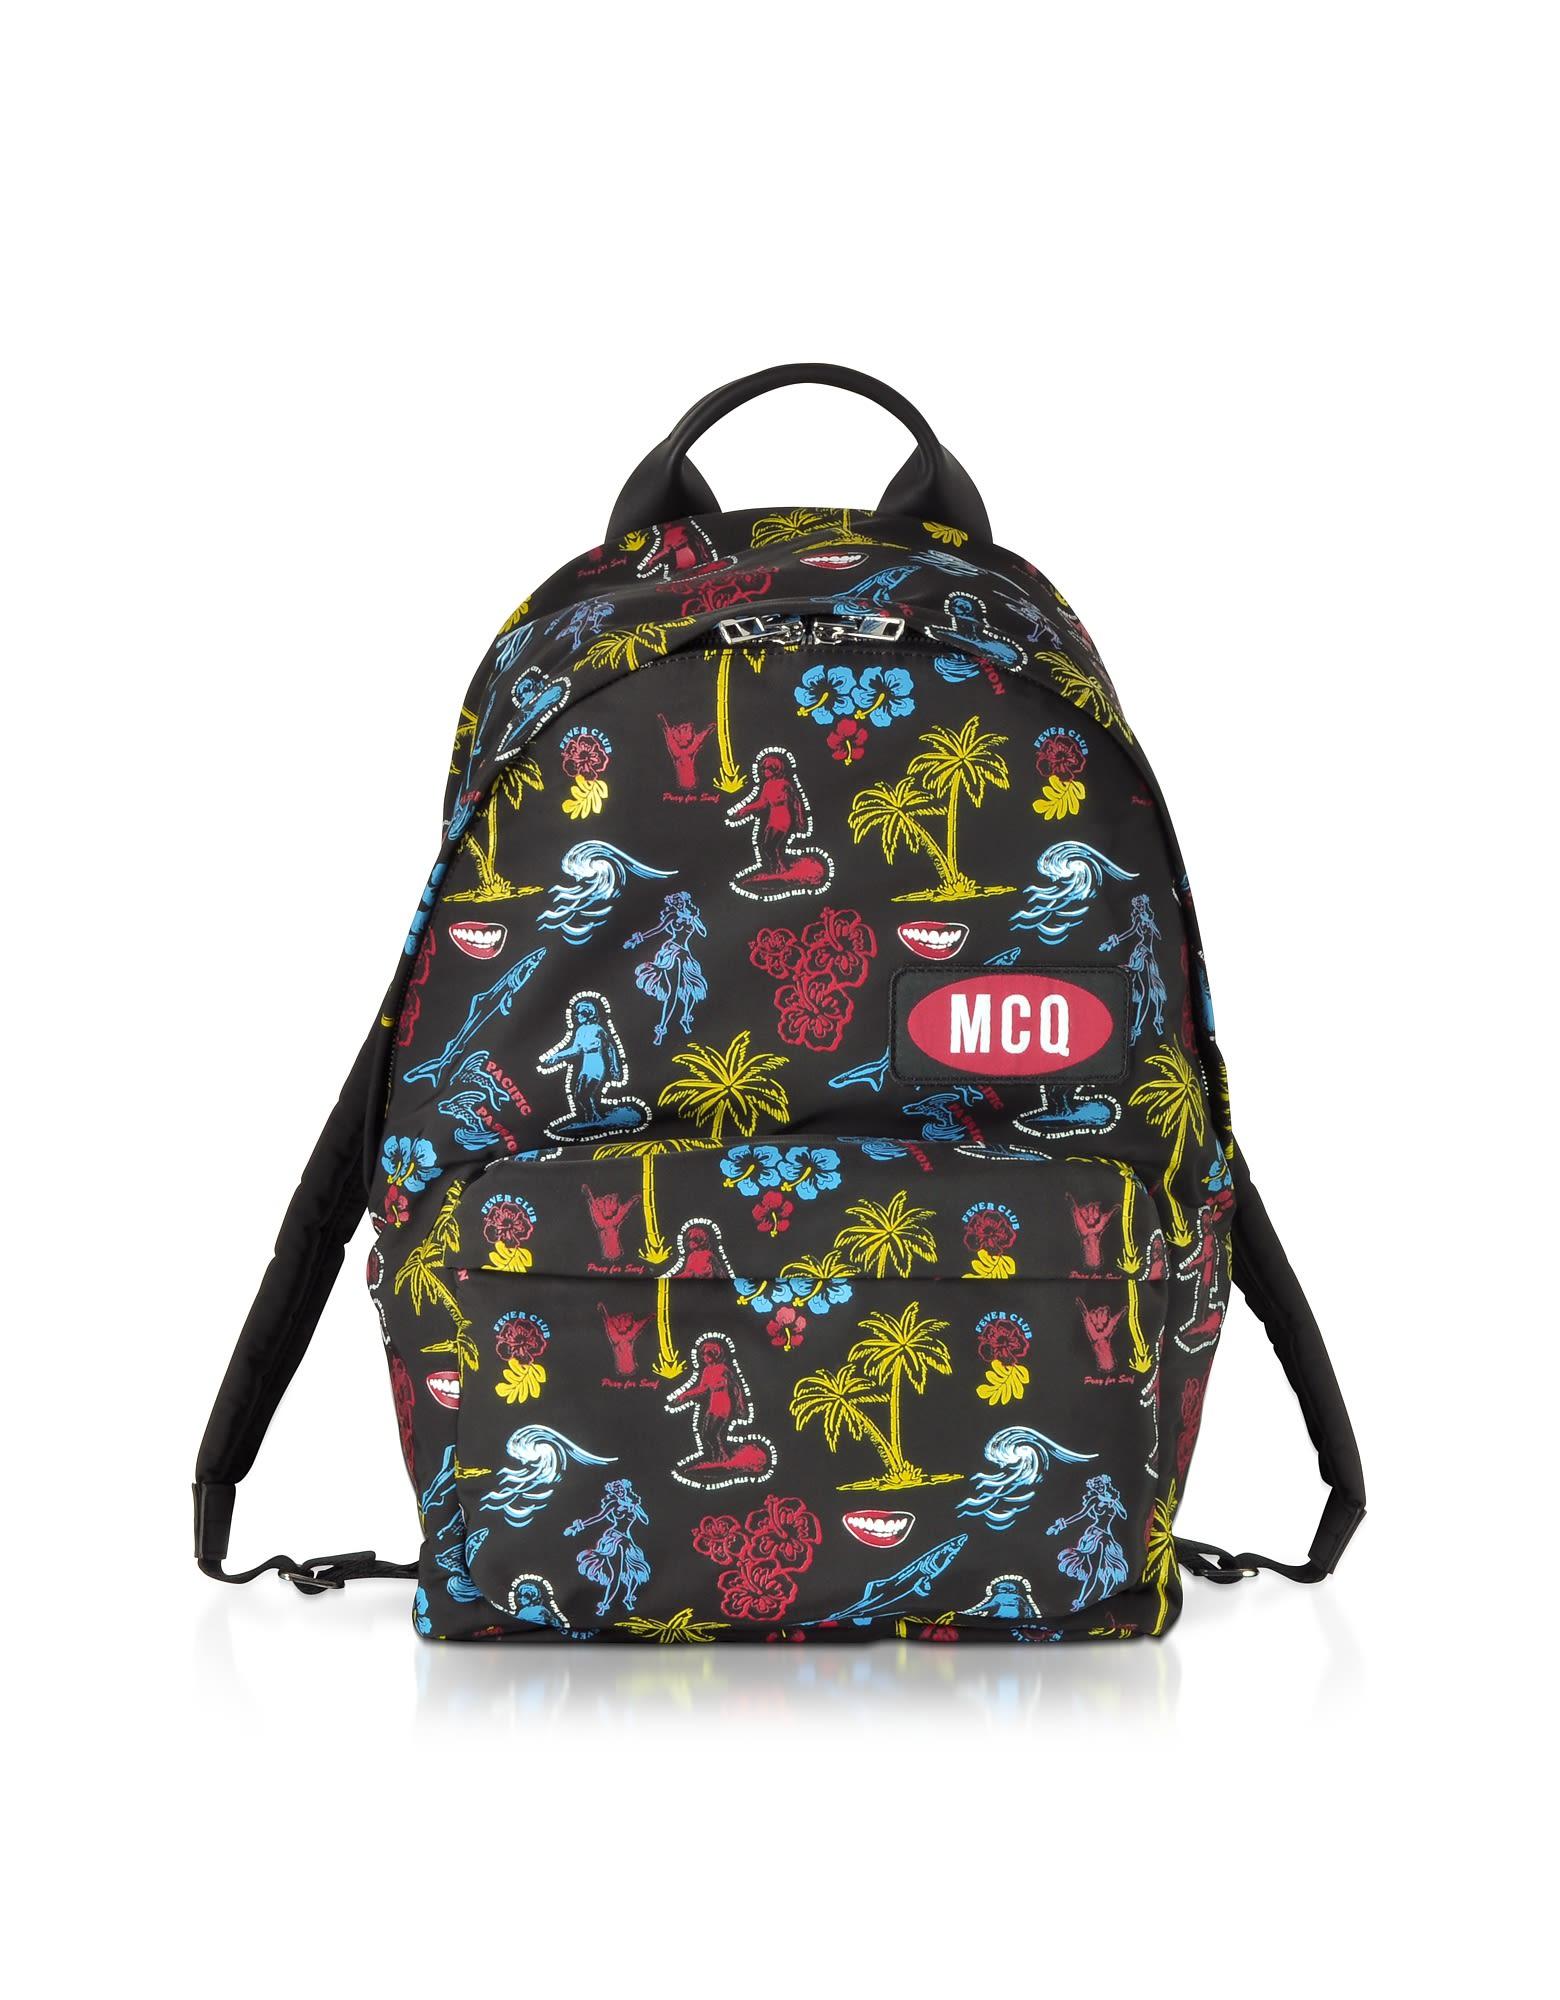 Mcq Alexander Mcqueen Darkest Black Printed Nylon Classic Backpack